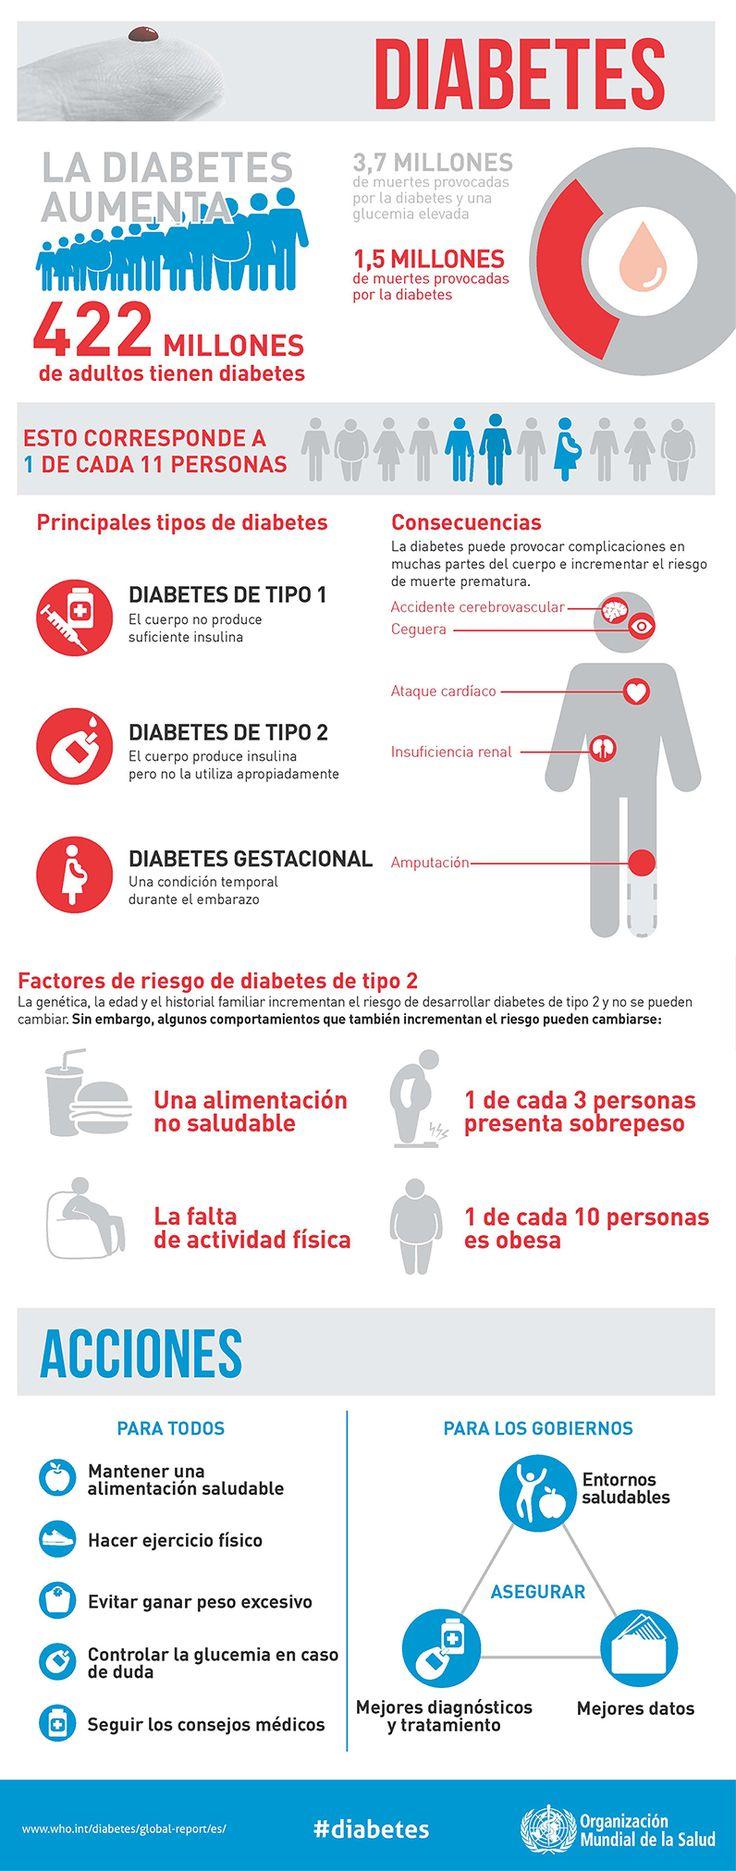 17 Best images about Diabetes on Pinterest   Tes, Postres